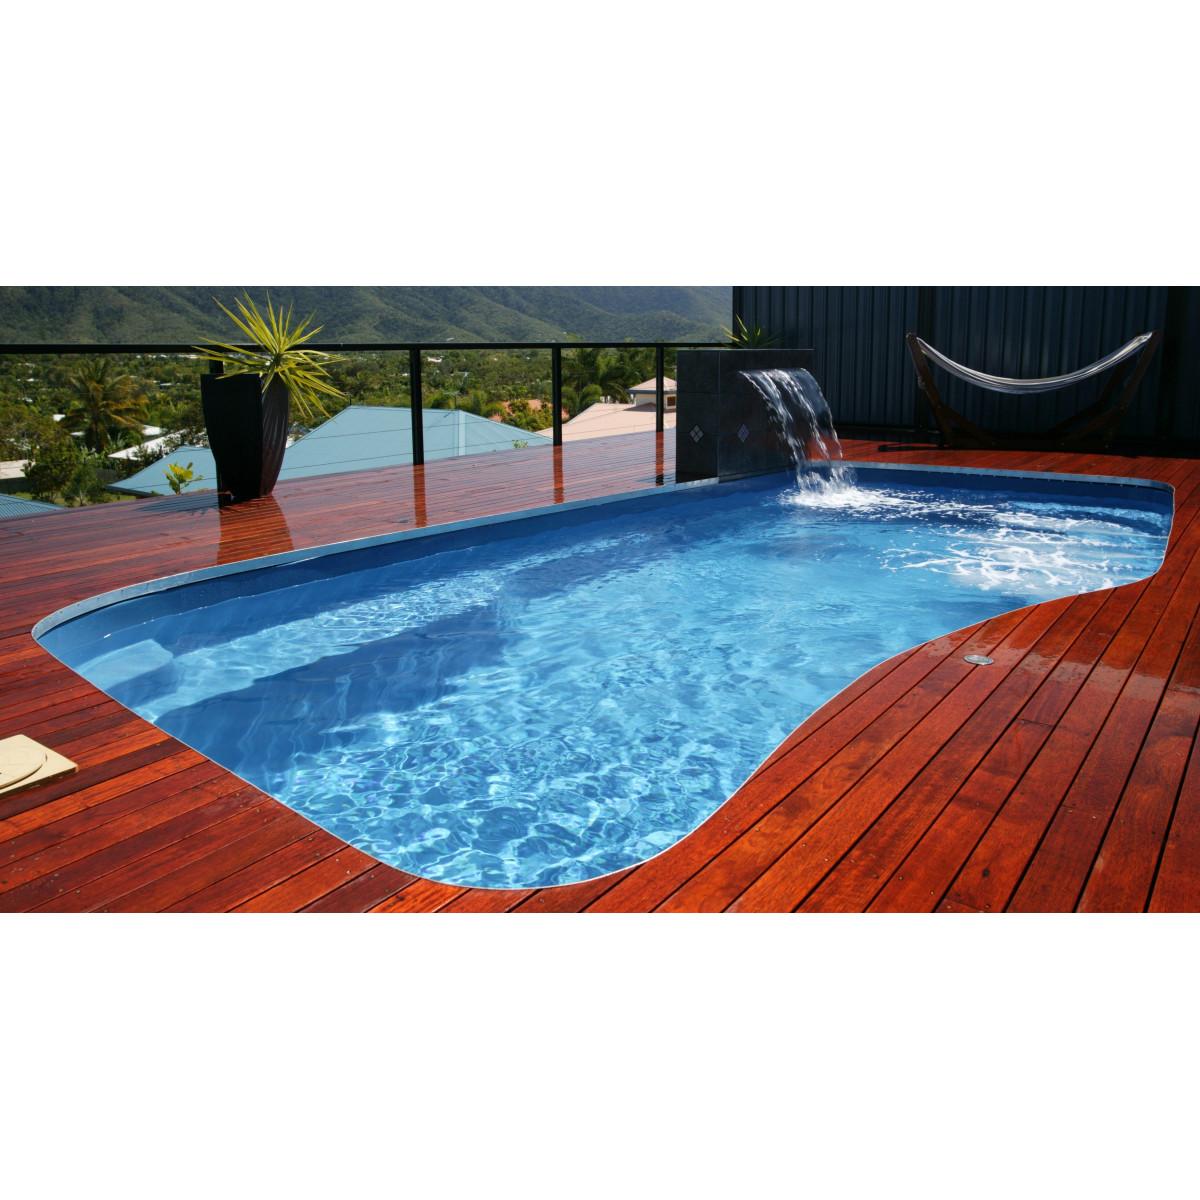 peinture piscine coque polyester arcapiscine maison tanche. Black Bedroom Furniture Sets. Home Design Ideas